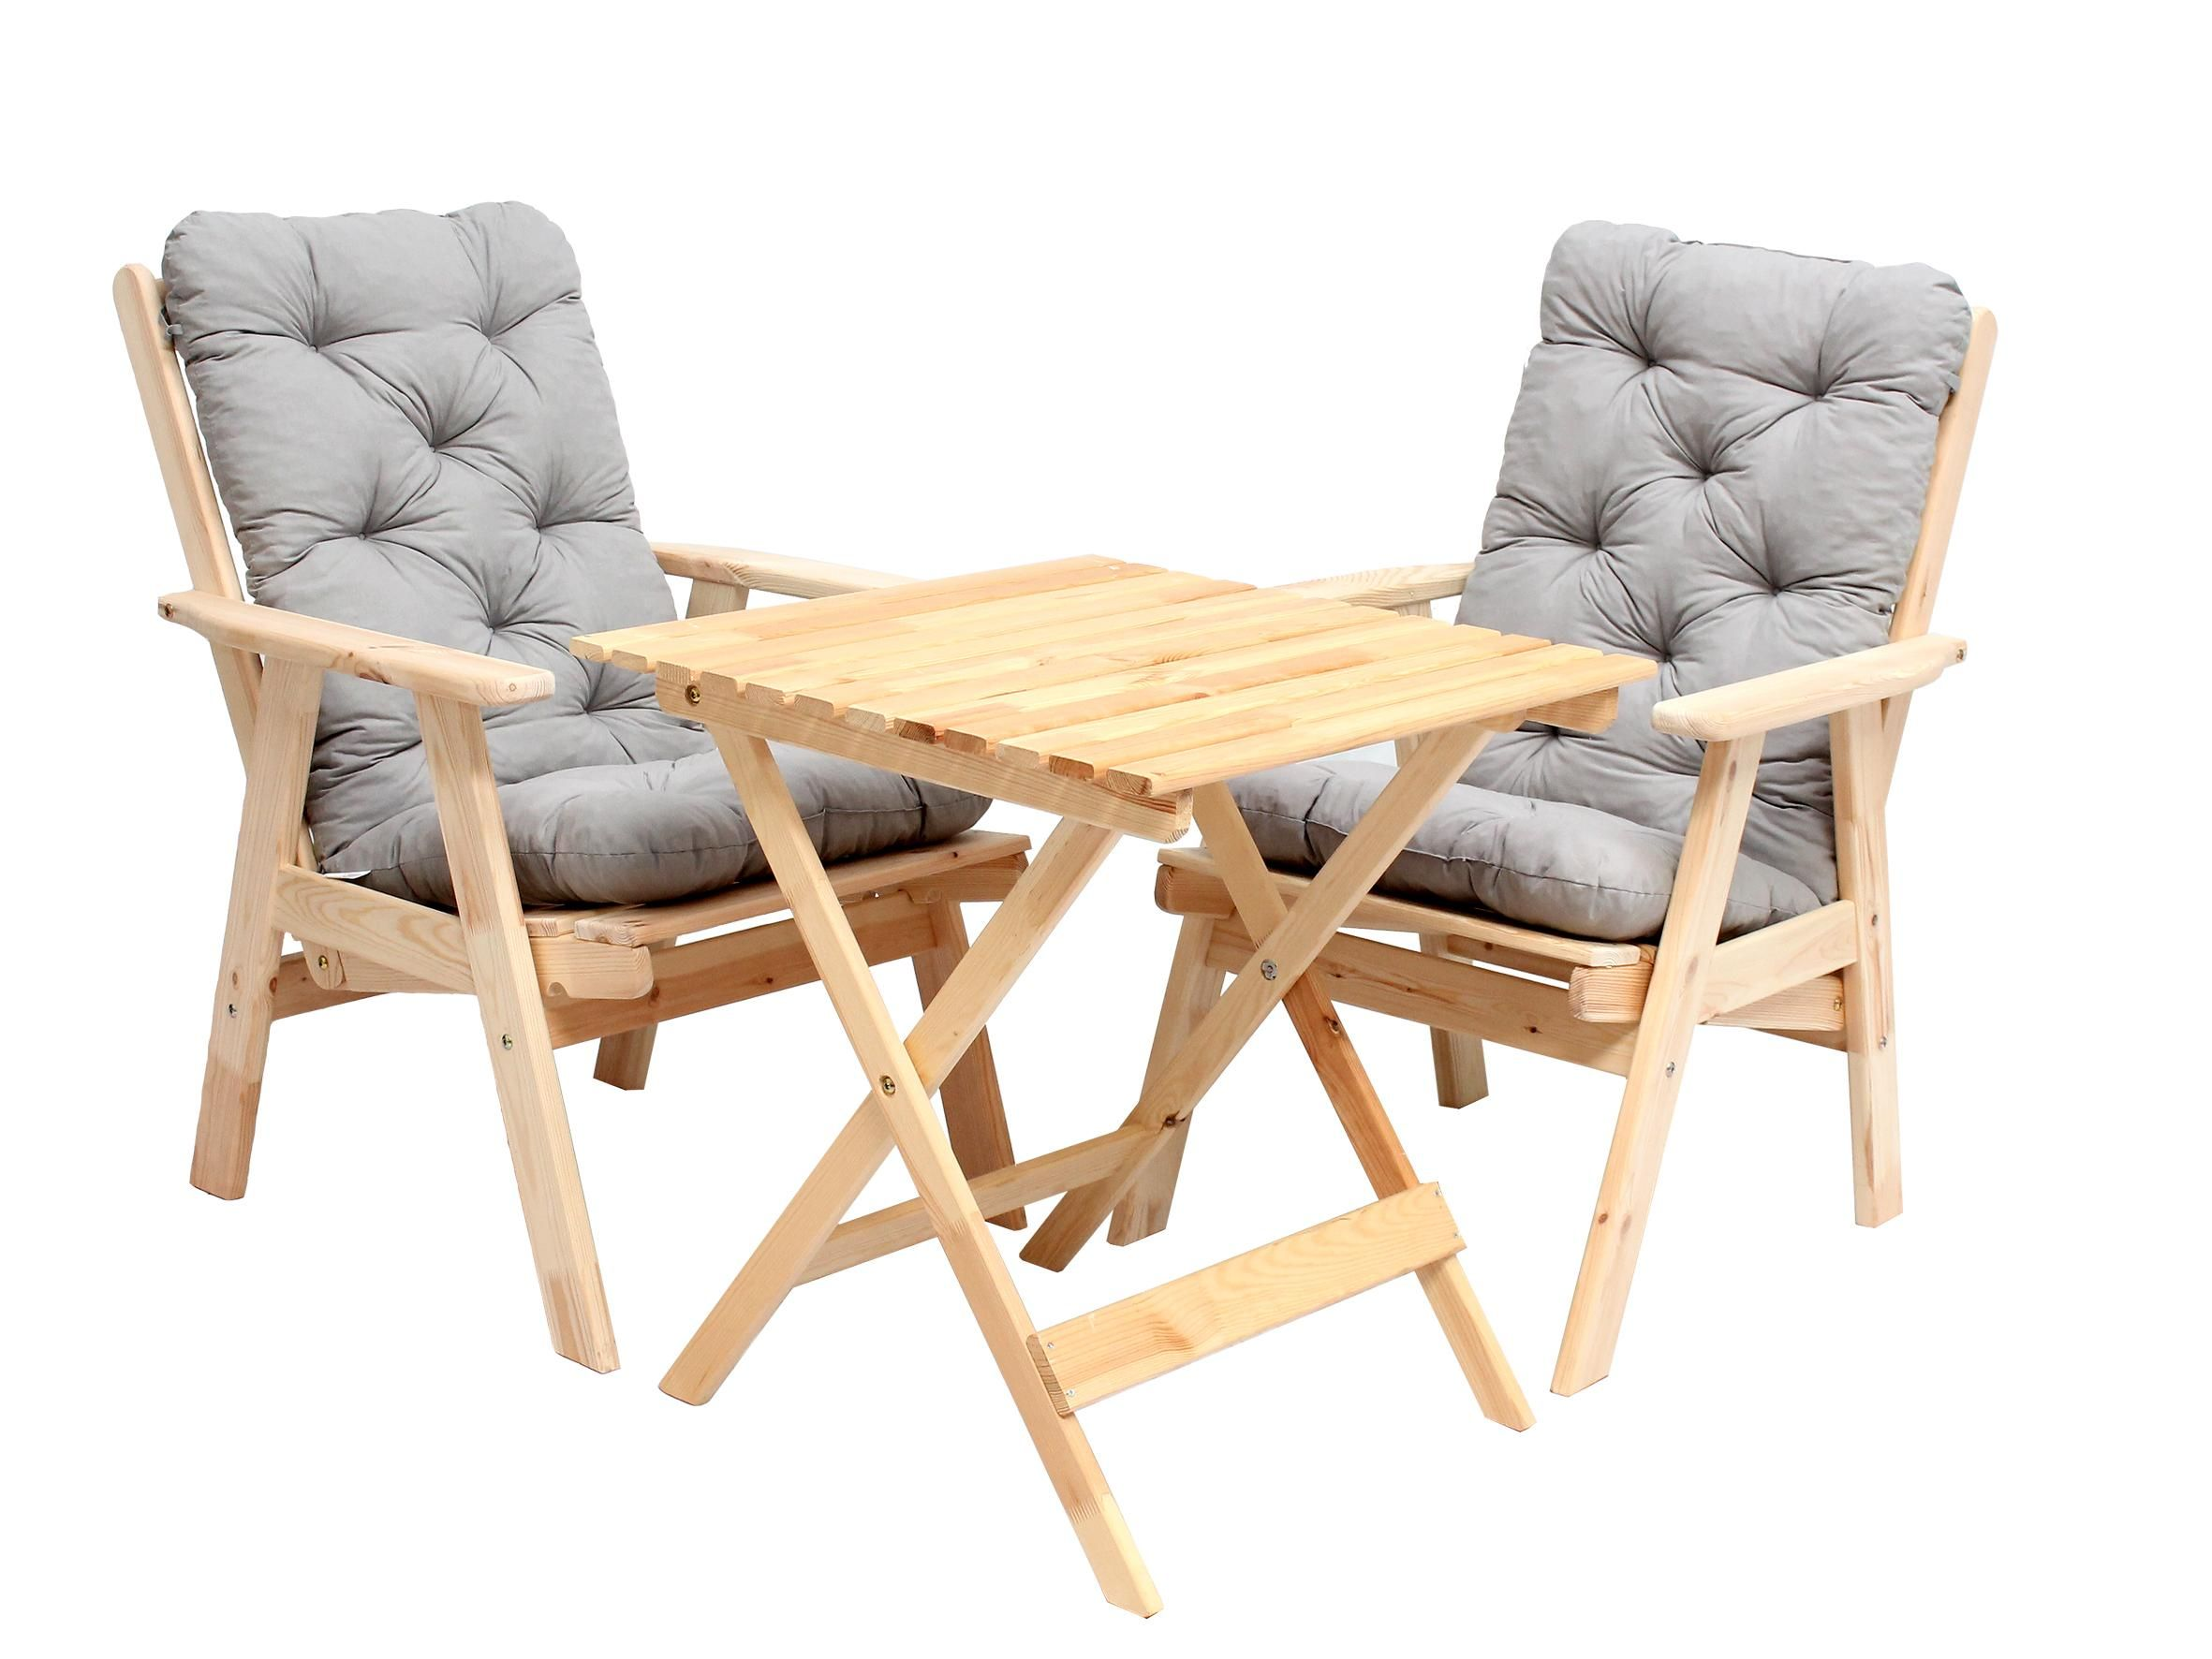 Ikea relaxsessel auflage  Ambientehome 90492 Balkonset verstellbarer Hochlehner Stuhl Varberg ...